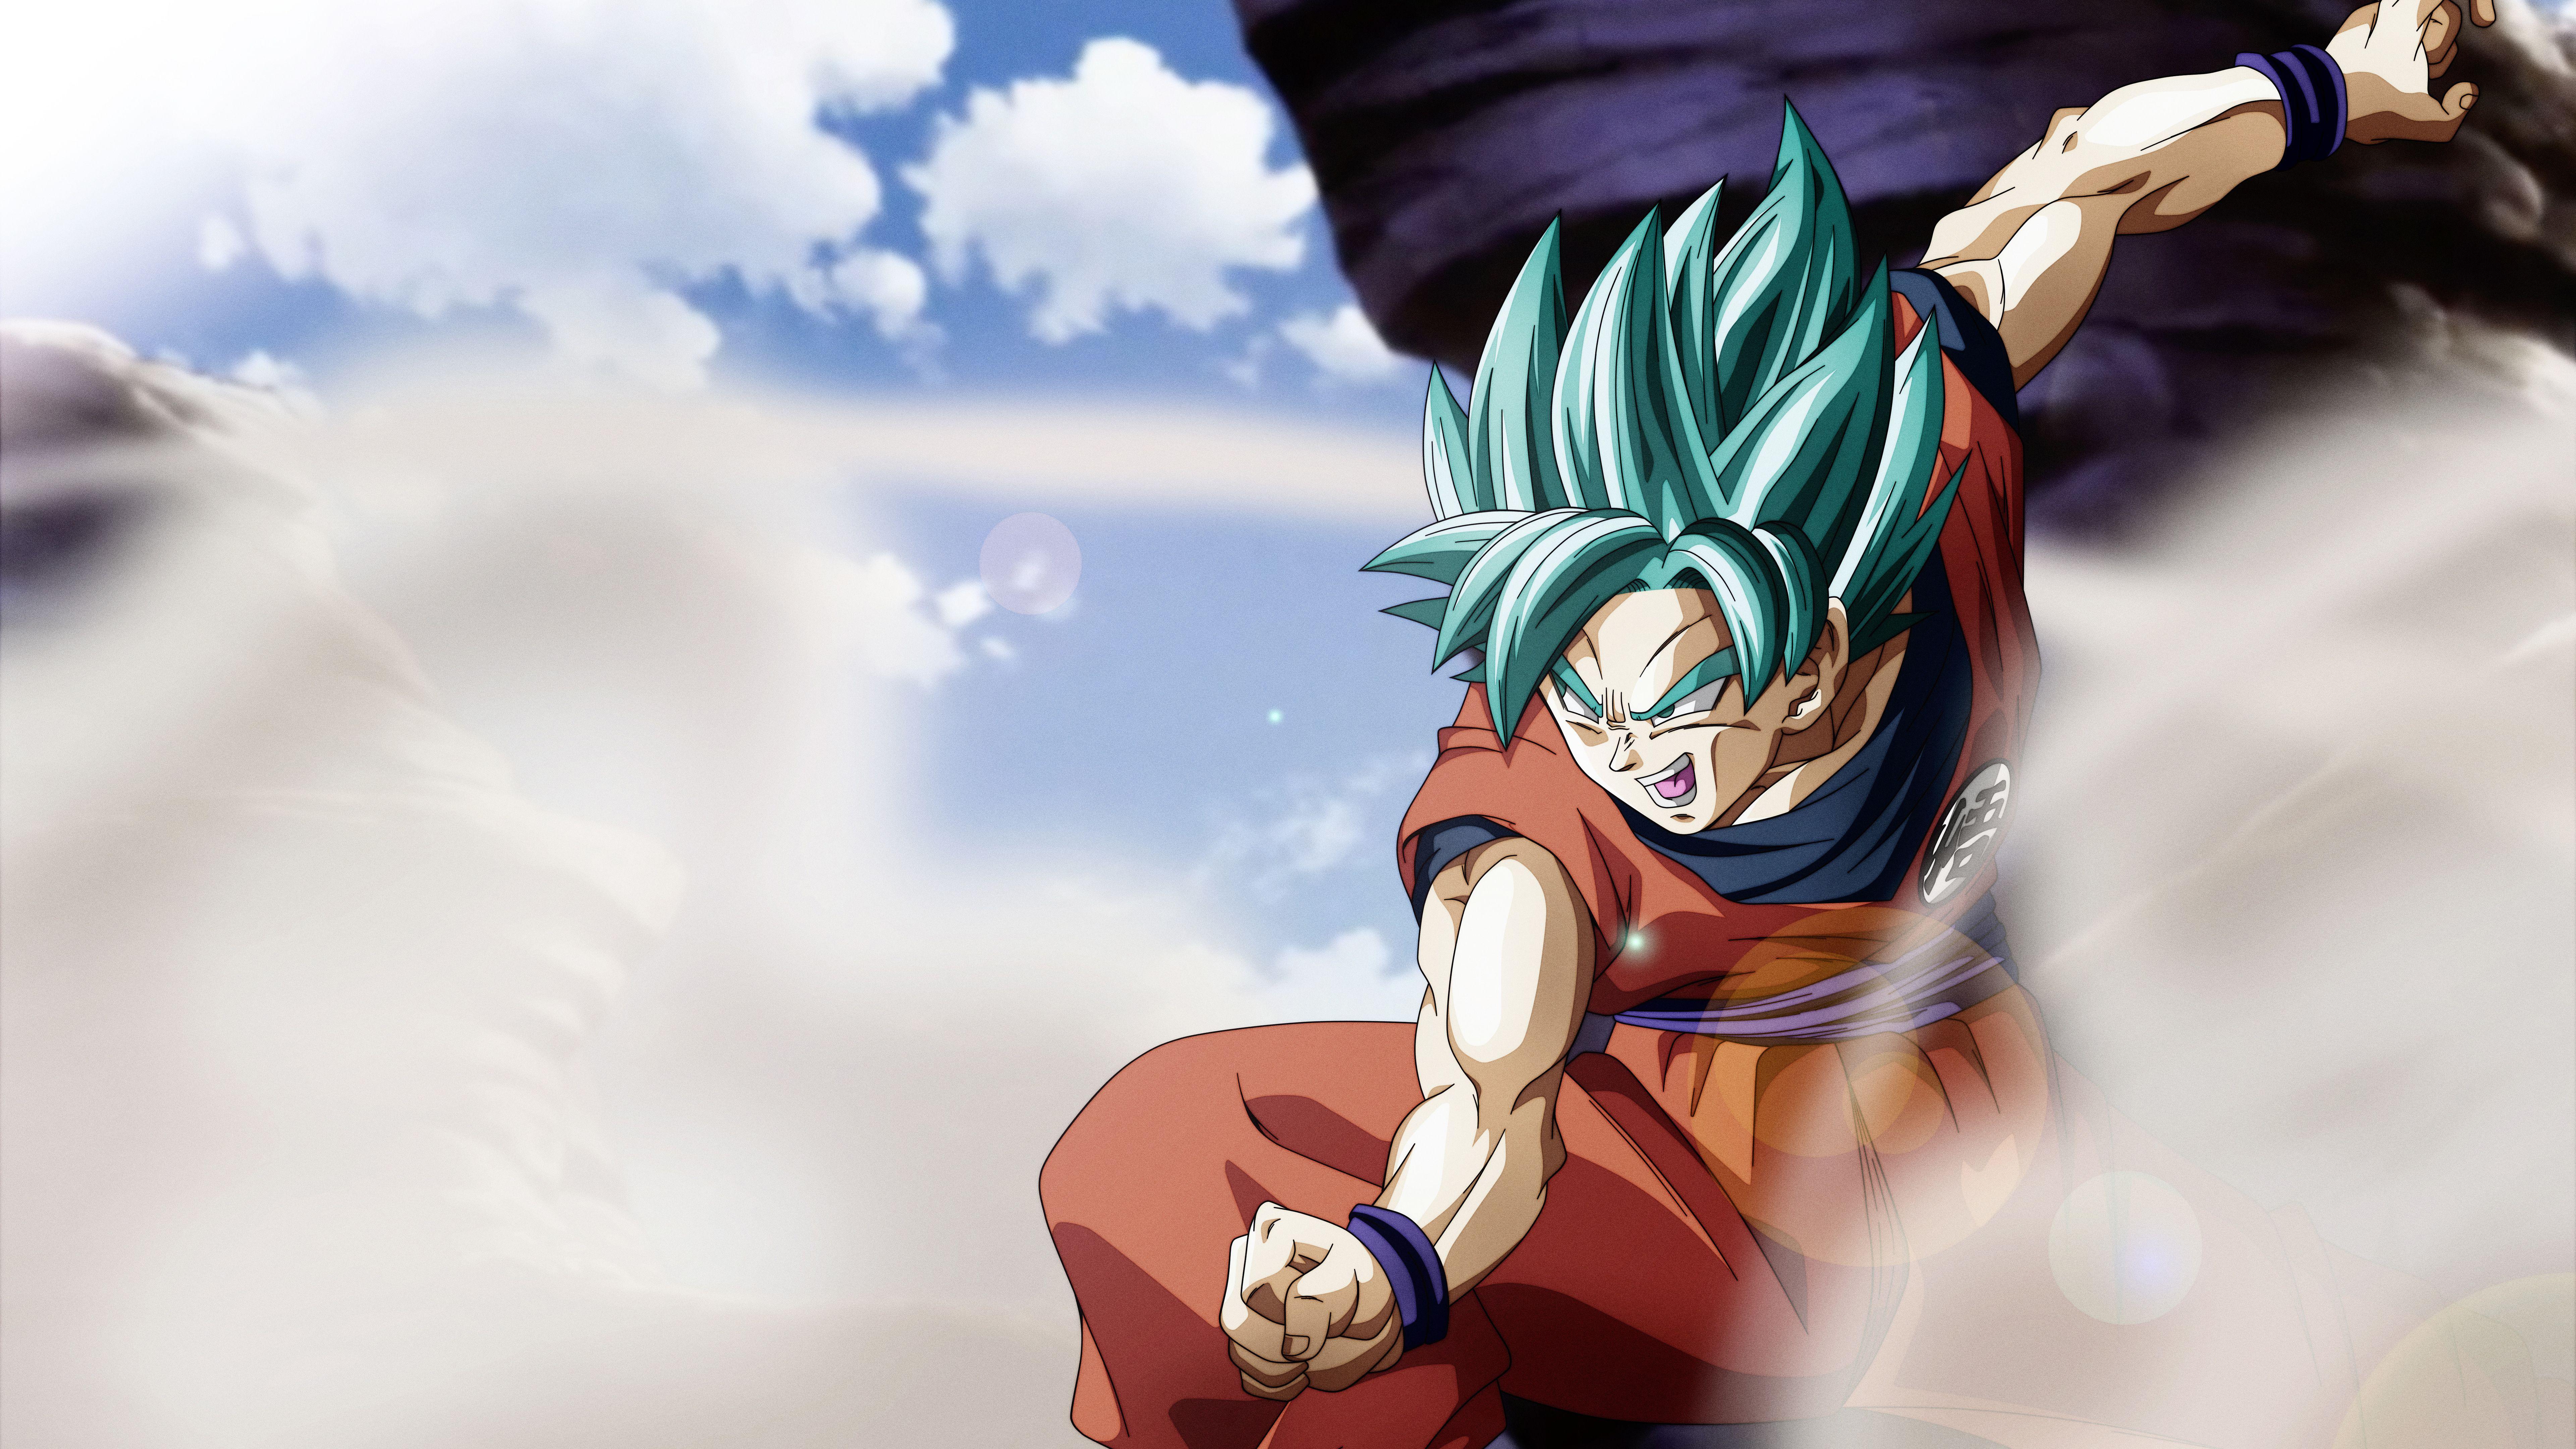 Goku Super Saiyan Blue Wallpaper Goku super saiyan blue